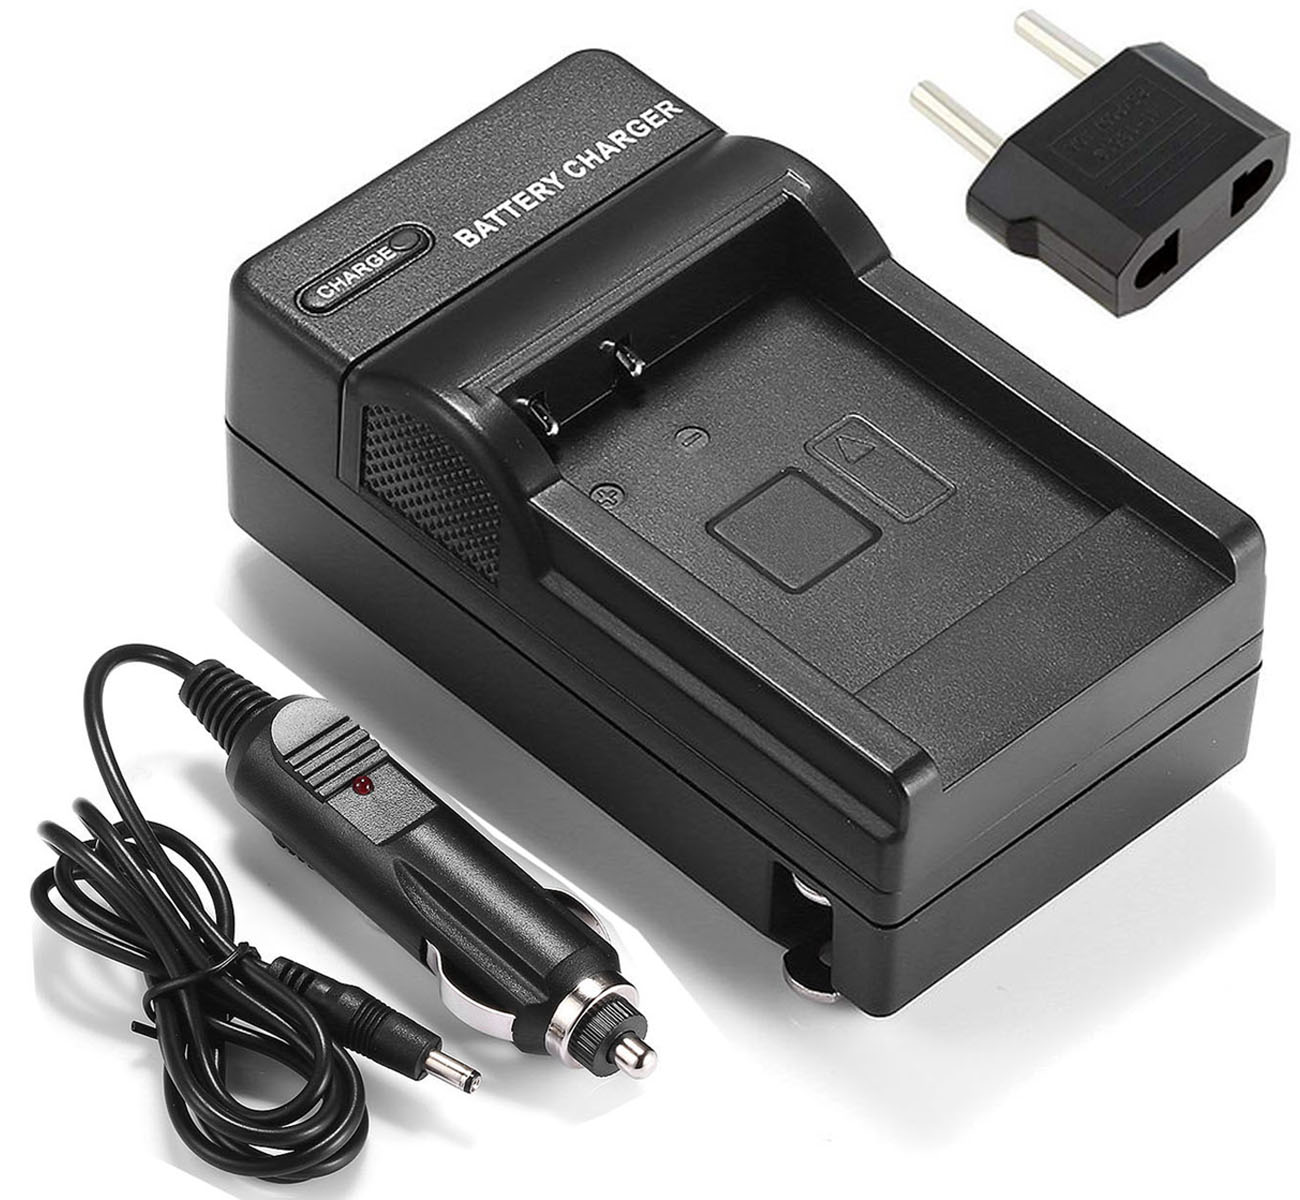 100 unidades microSD box tarjeta de memoria estuche funda protectora funda aufbewahrungsbo X